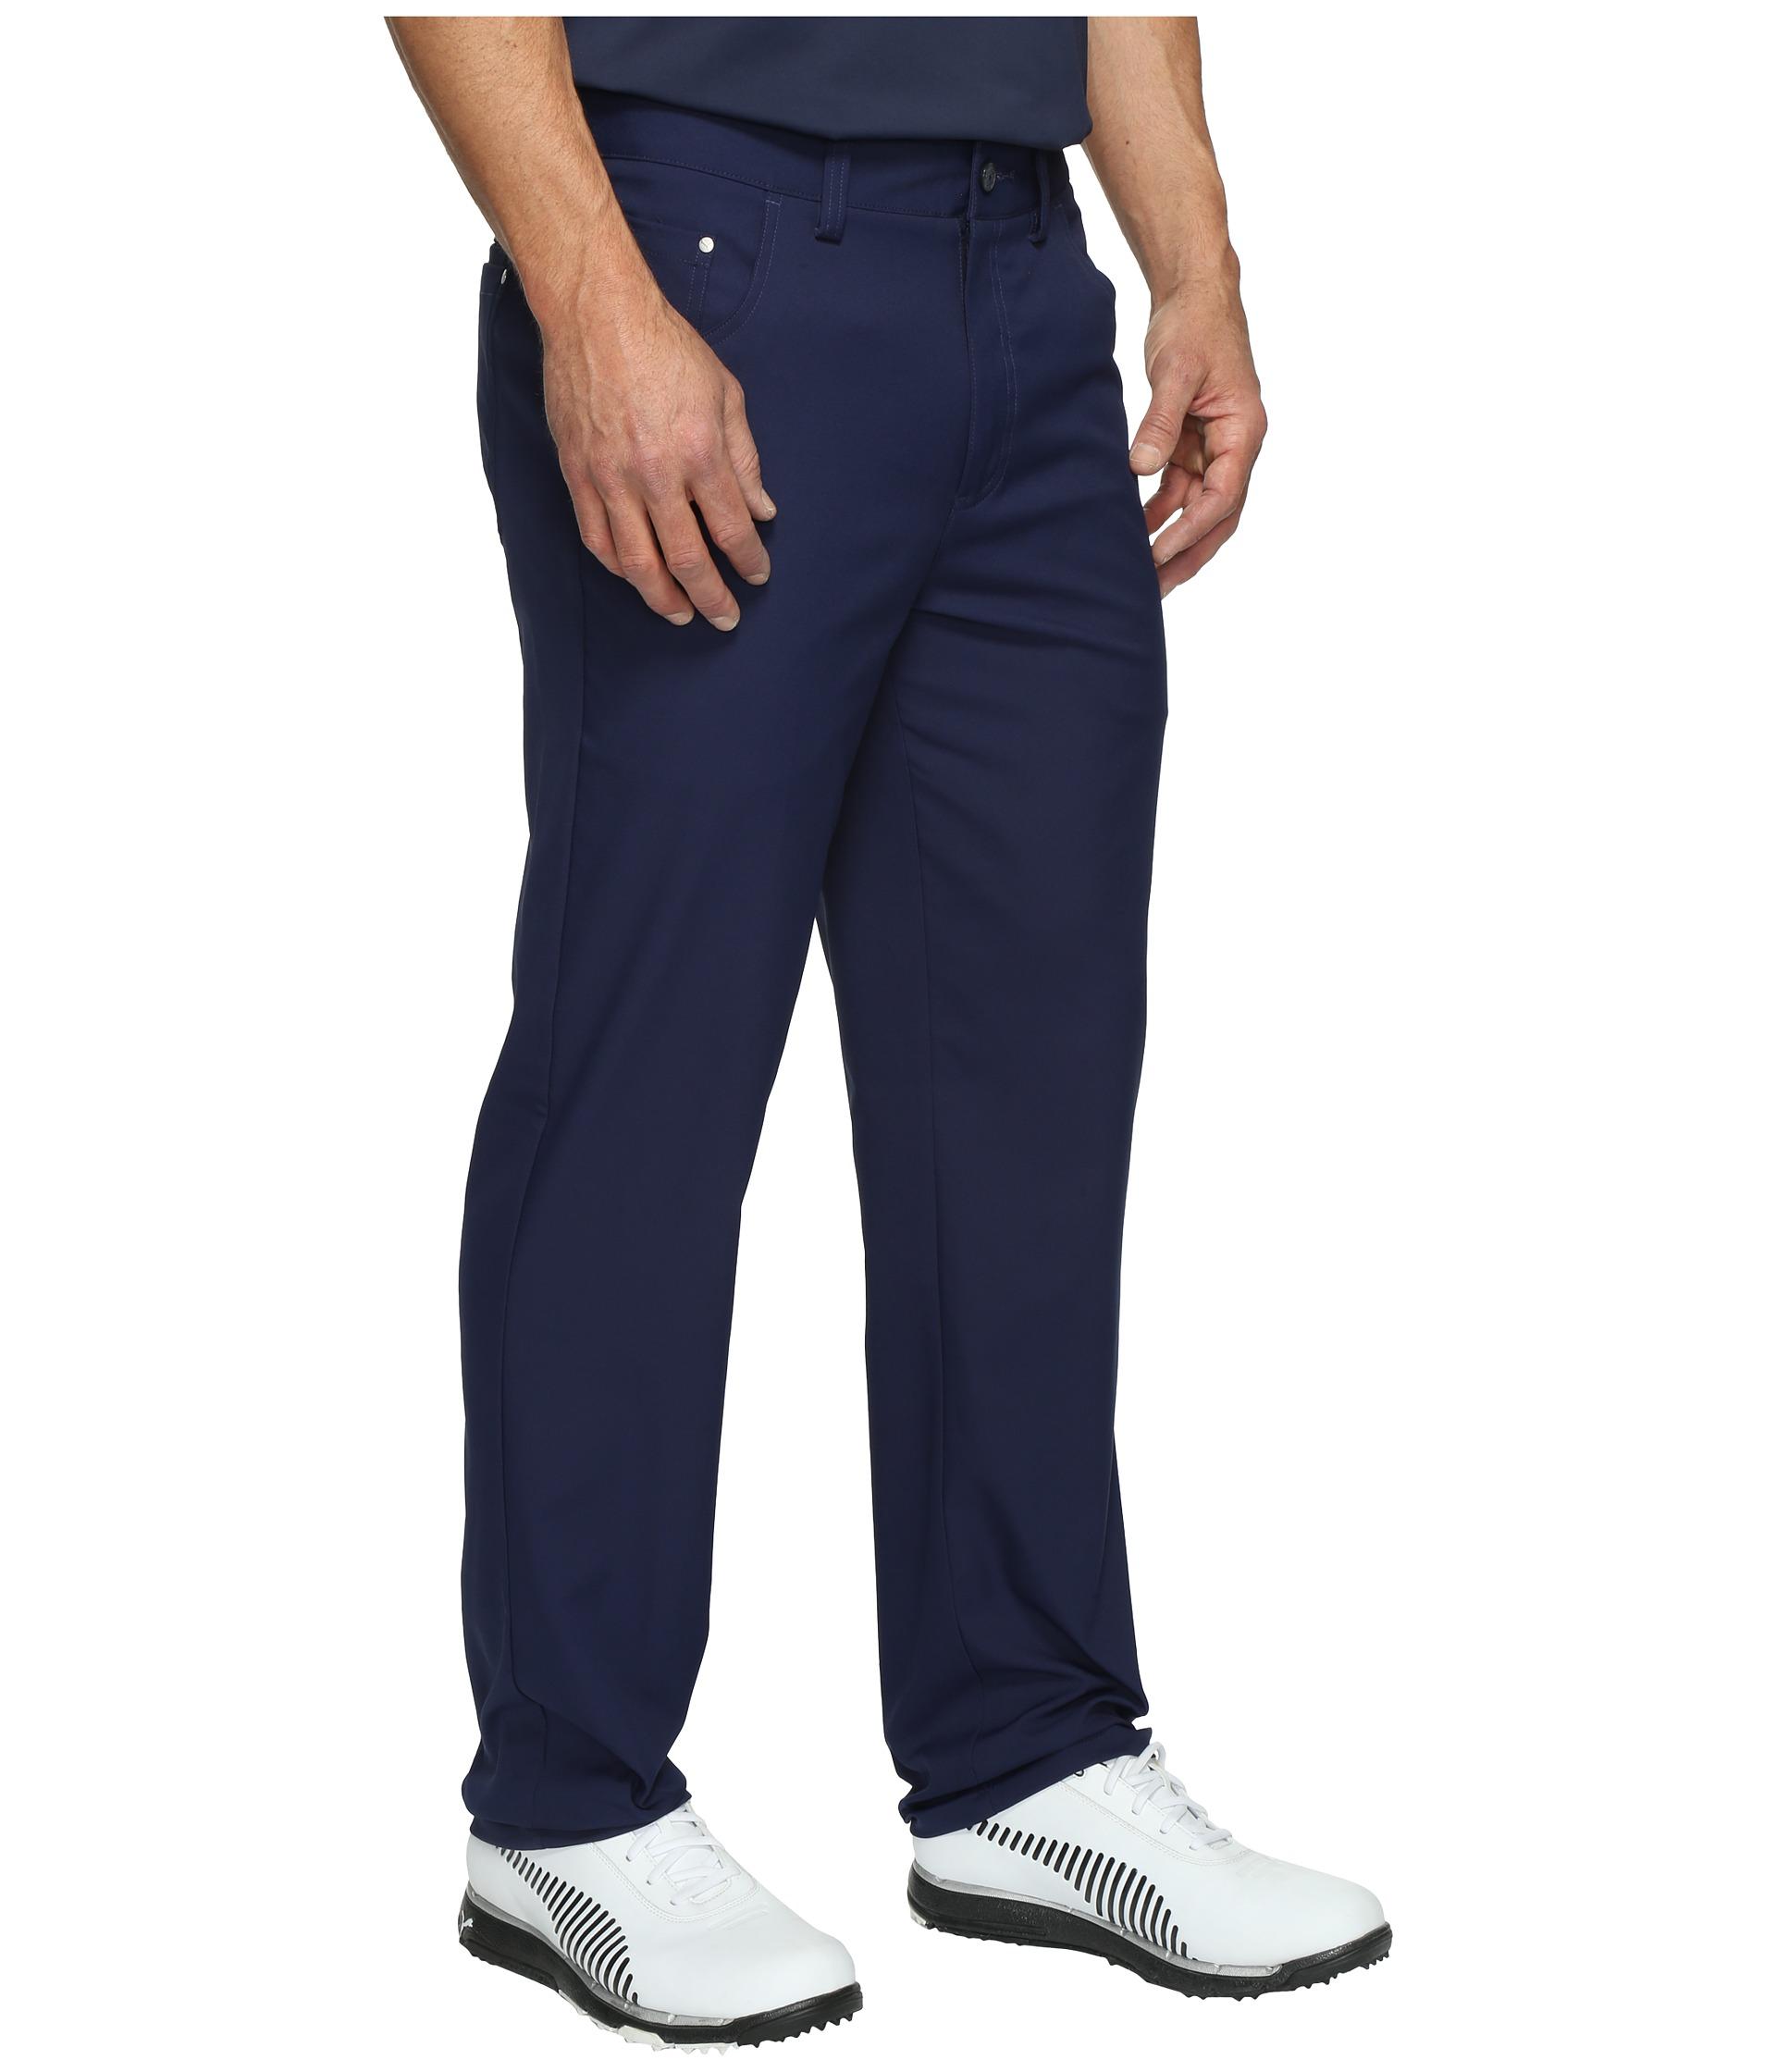 Innovative Tech Womens Golf Capri Pants White Tech Womens Womens Puma Womens Golf